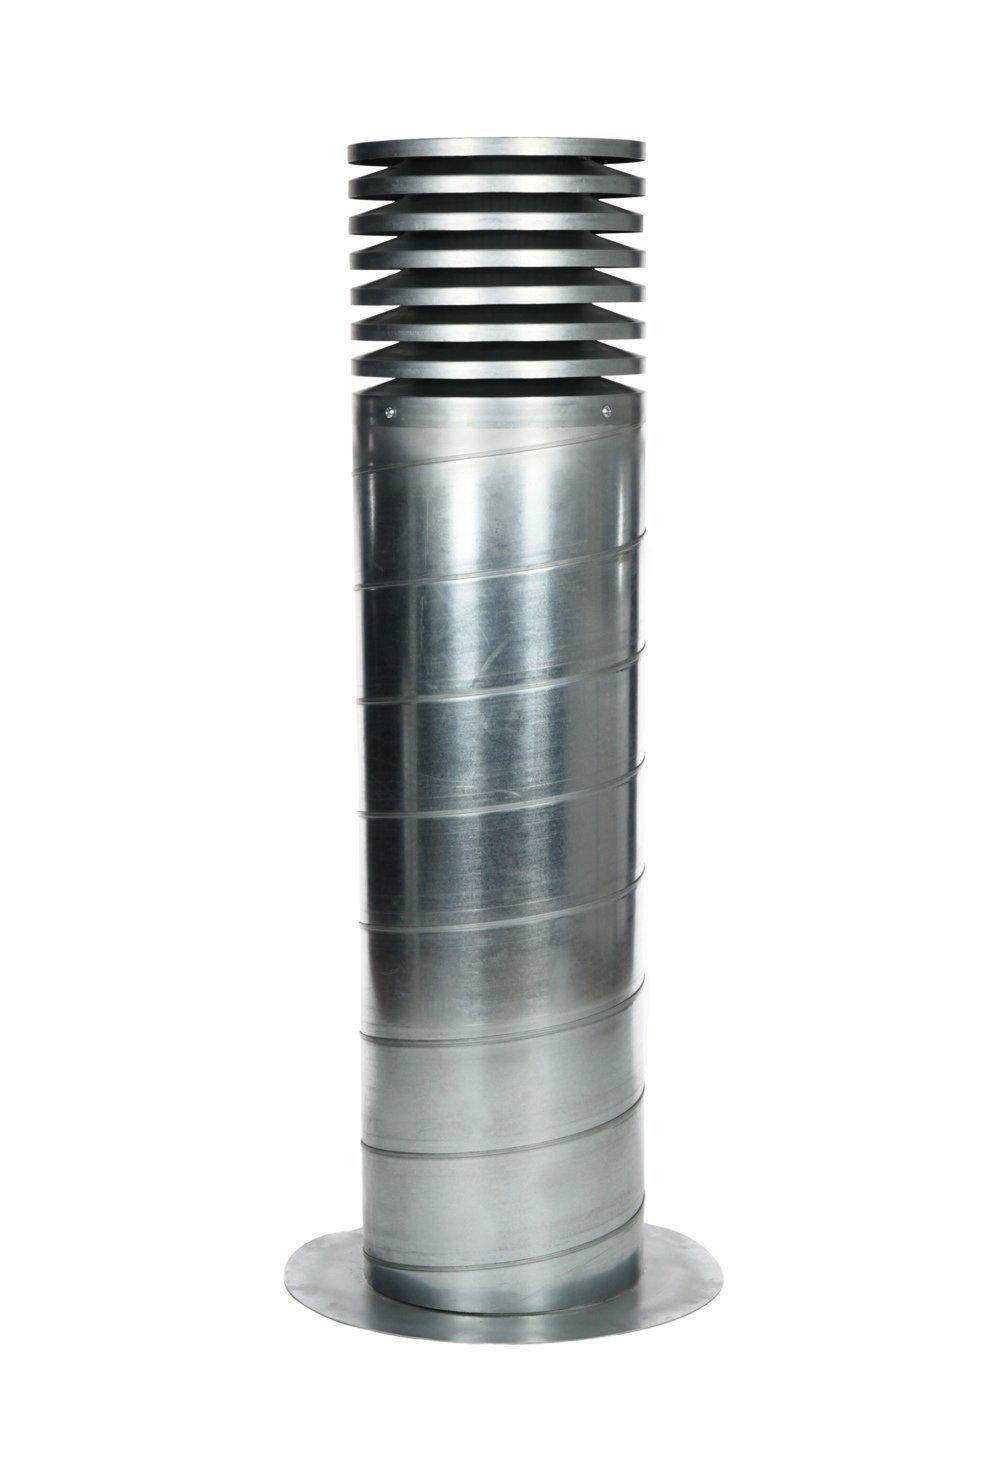 Ansaugturm für Erdwärmetauscher AV160